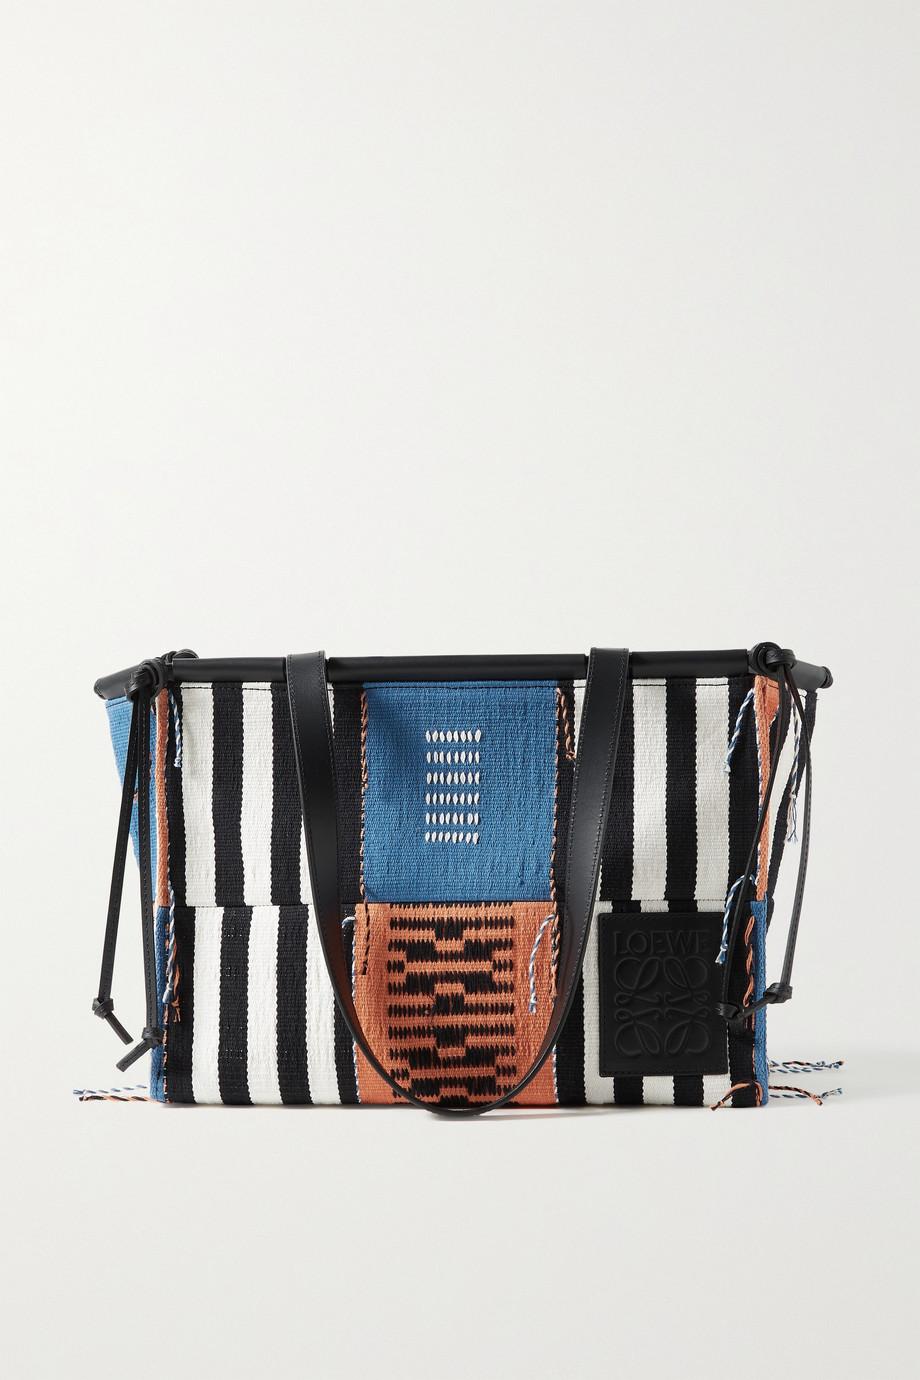 Loewe + Paula's Ibiza Cushion Tote aus Canvas in Patchwork-Optik mit Lederbesatz